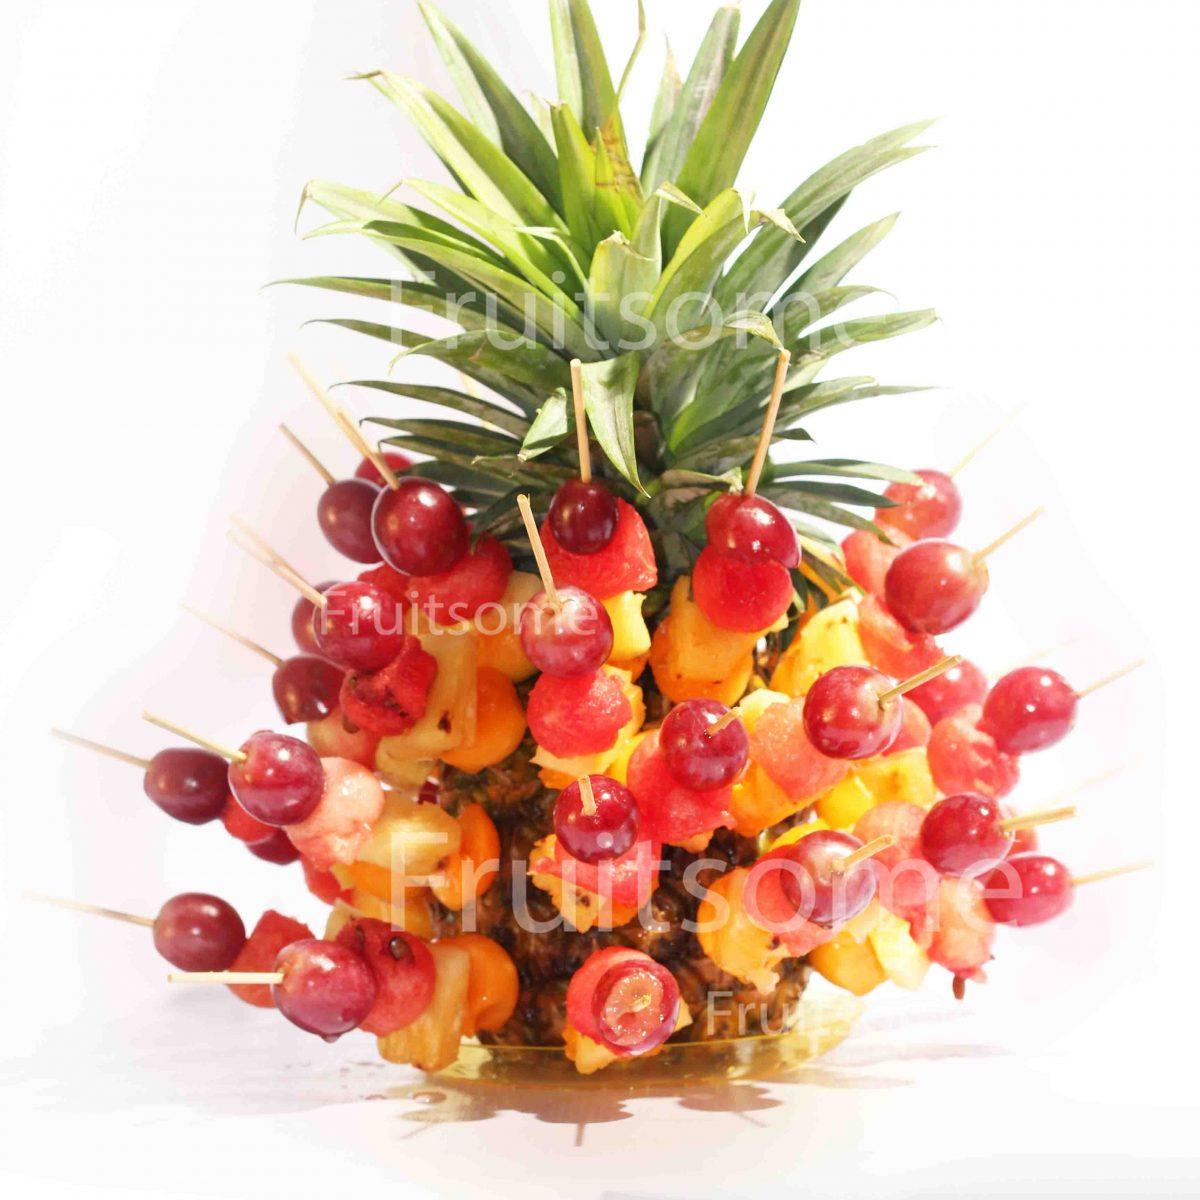 FRUITSOME FRUIT KEBABS TOWER 45 STICKS. N15,000.00